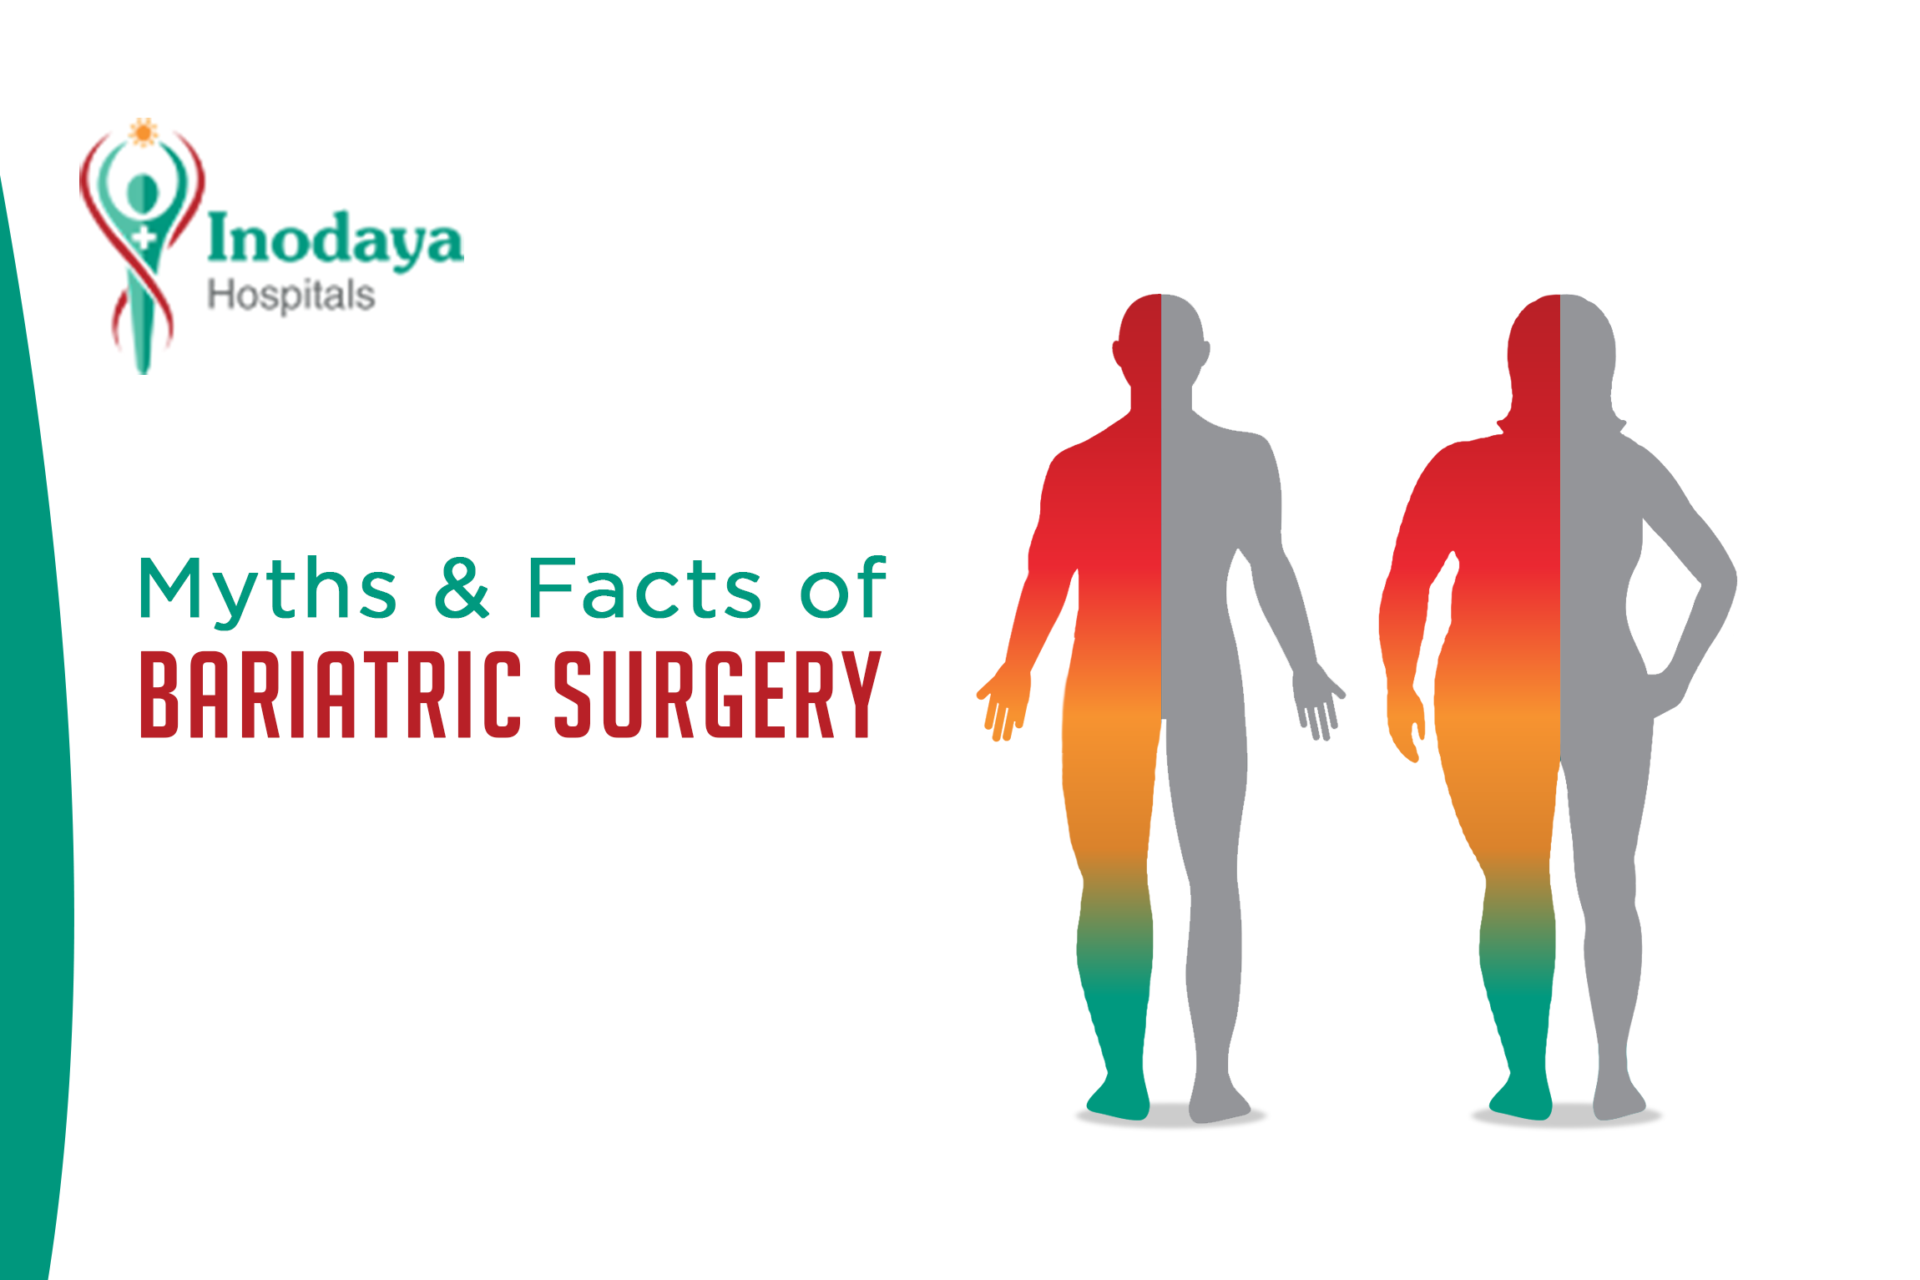 Inodaya bariatric surgery thumbnail